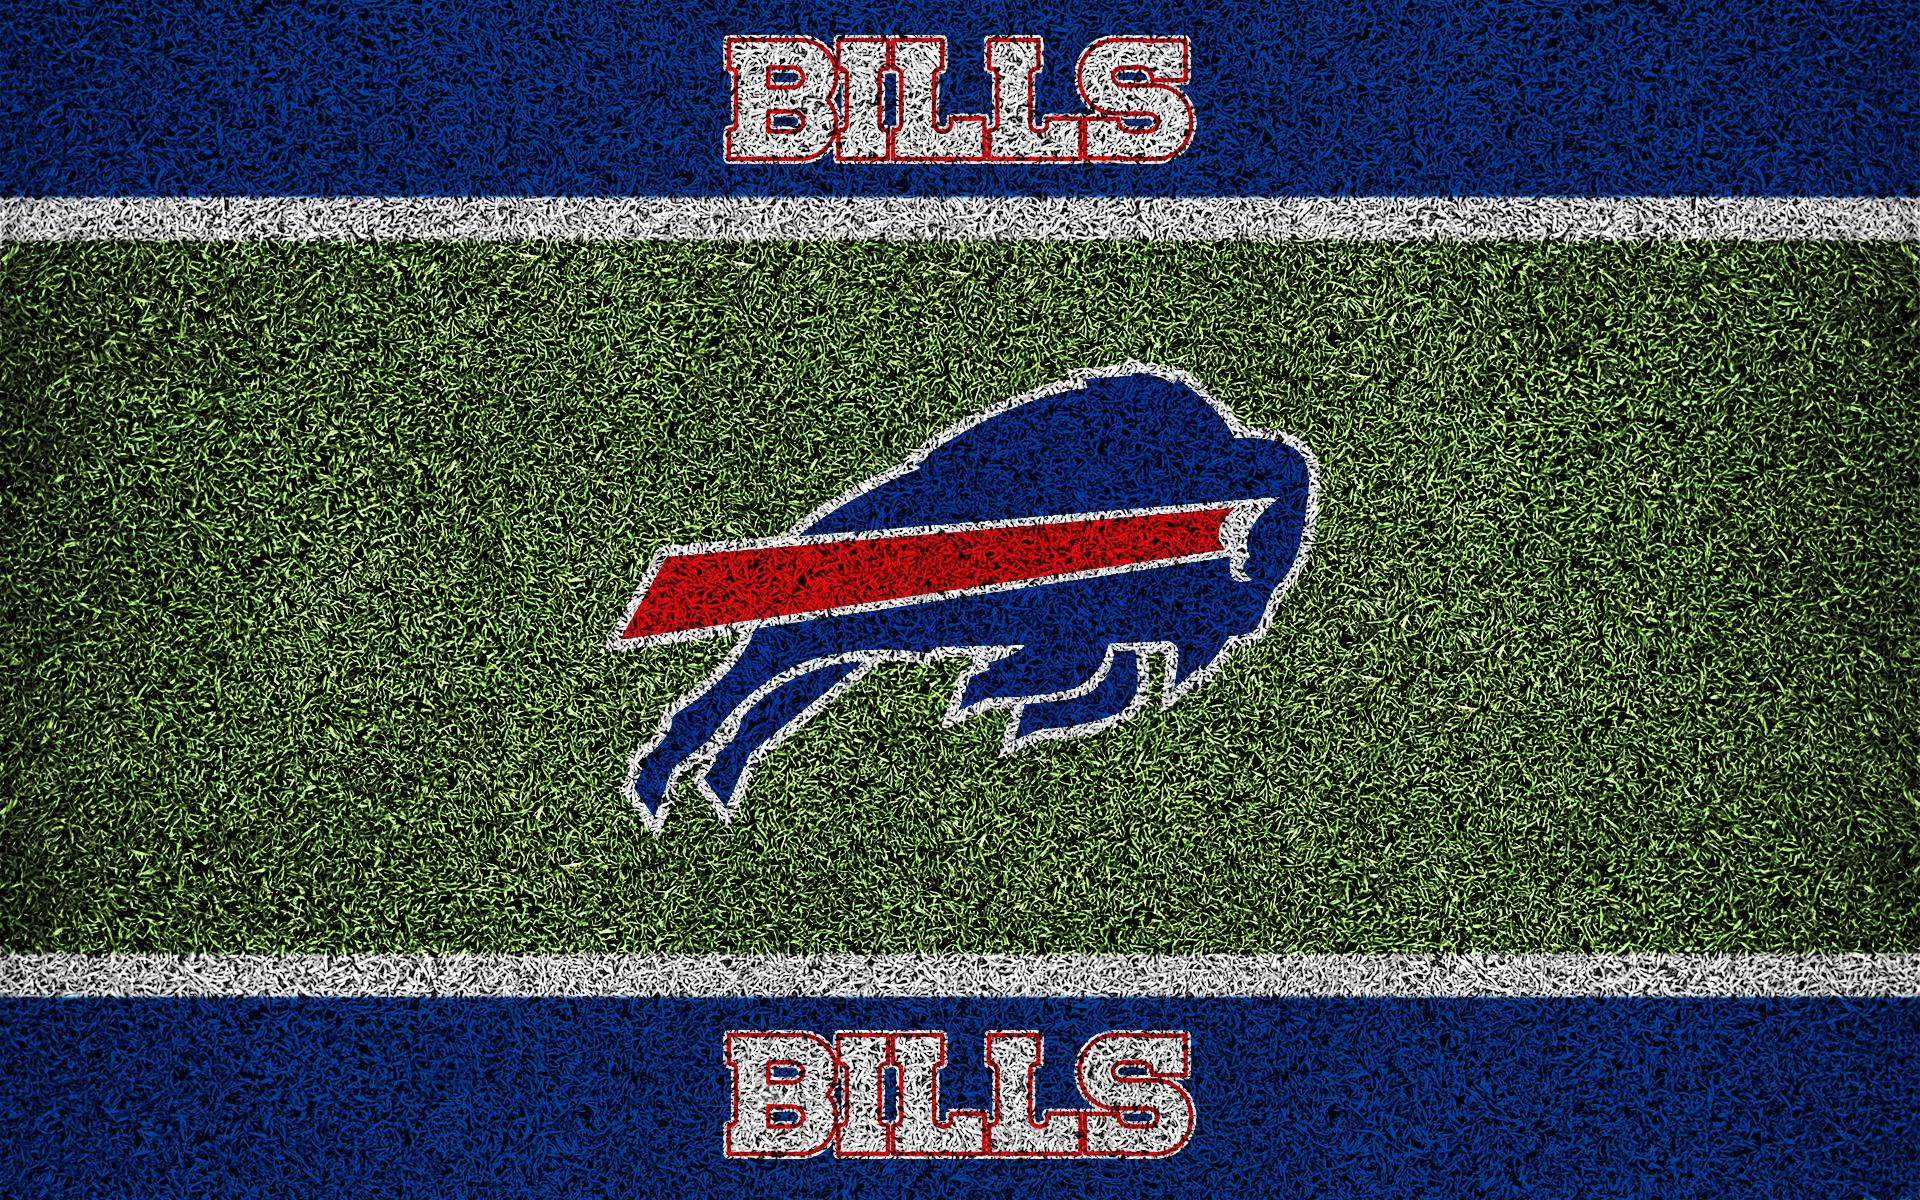 buffalo bills wallpapers buffalo bills desktop wallpapers 61 1920x1080 1920x1200